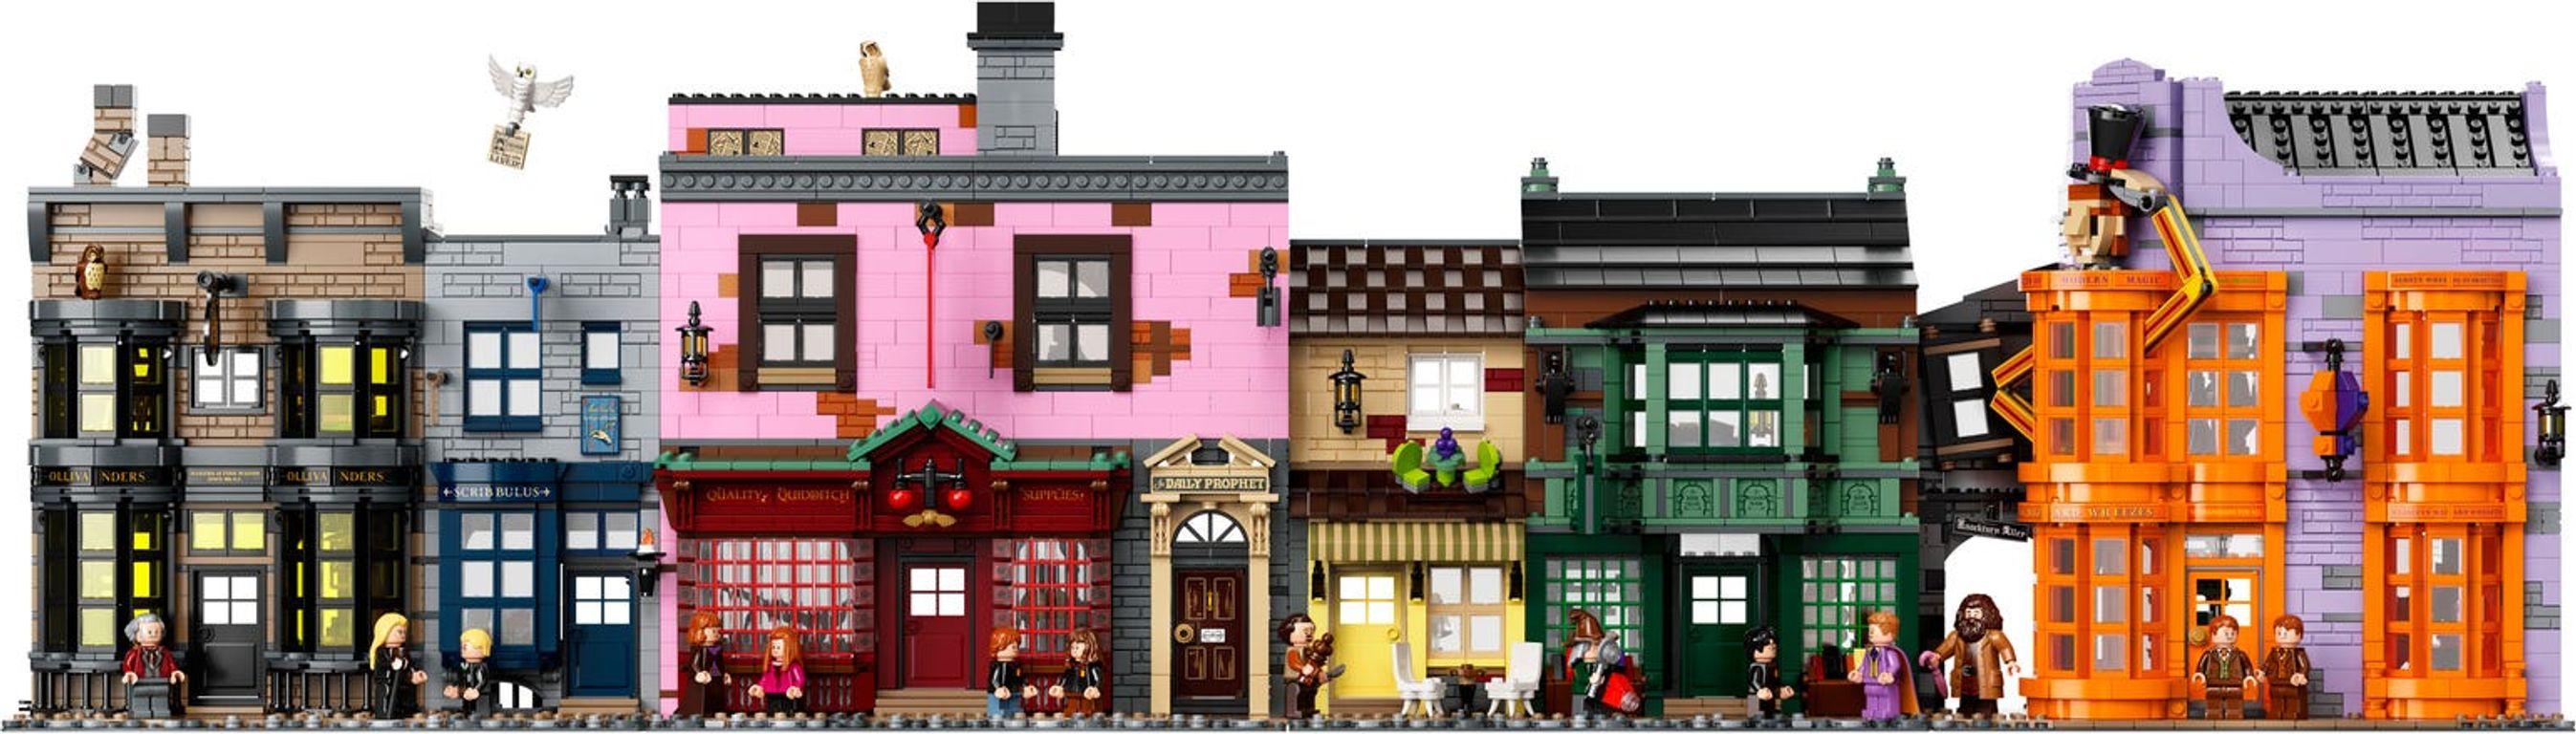 LEGO® Harry Potter™ Diagon Alley™ building